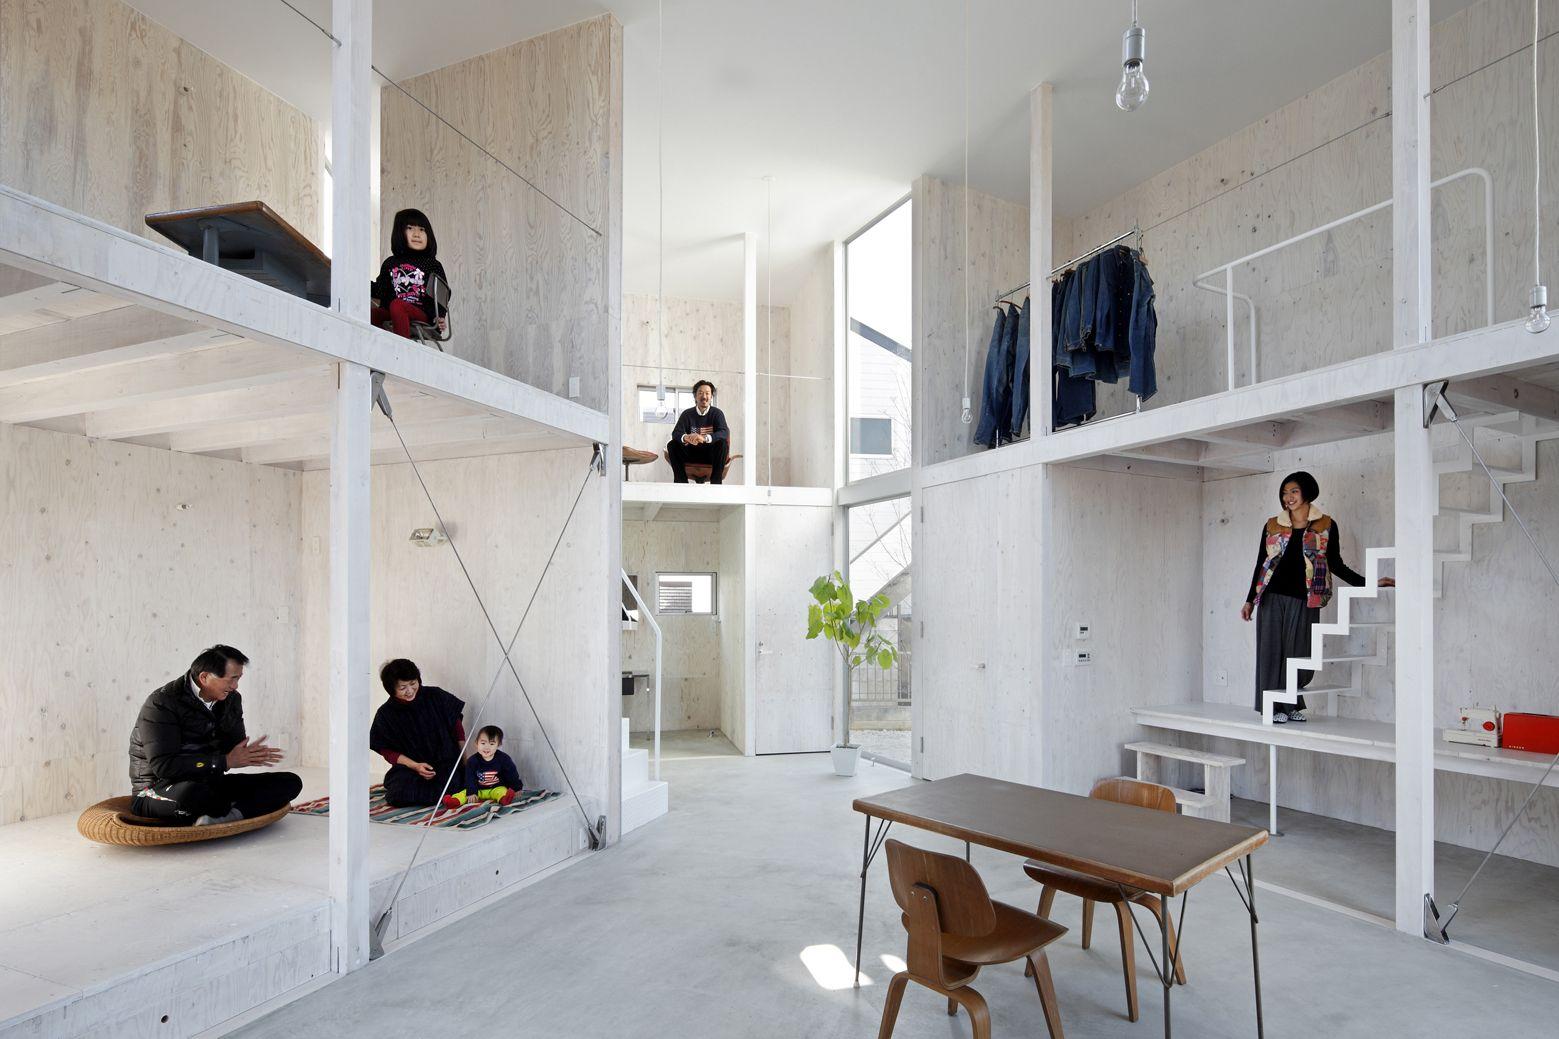 Yamazaki Kentaro Design Workshop | a f a s i a